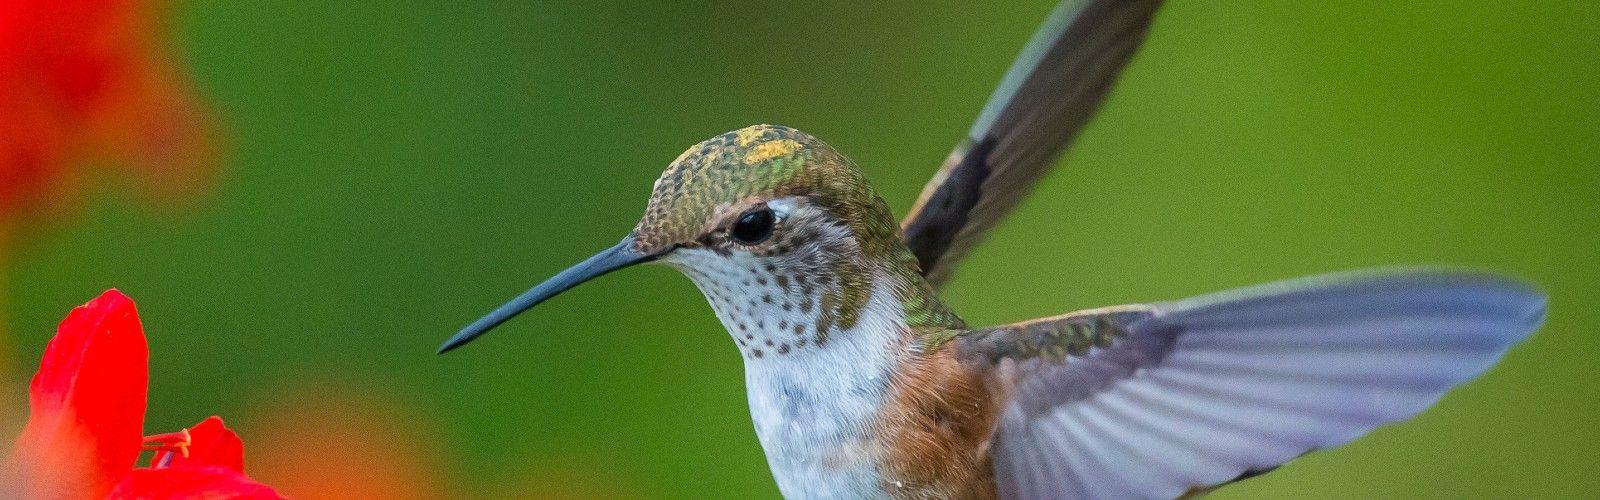 a close up of a hummingbird